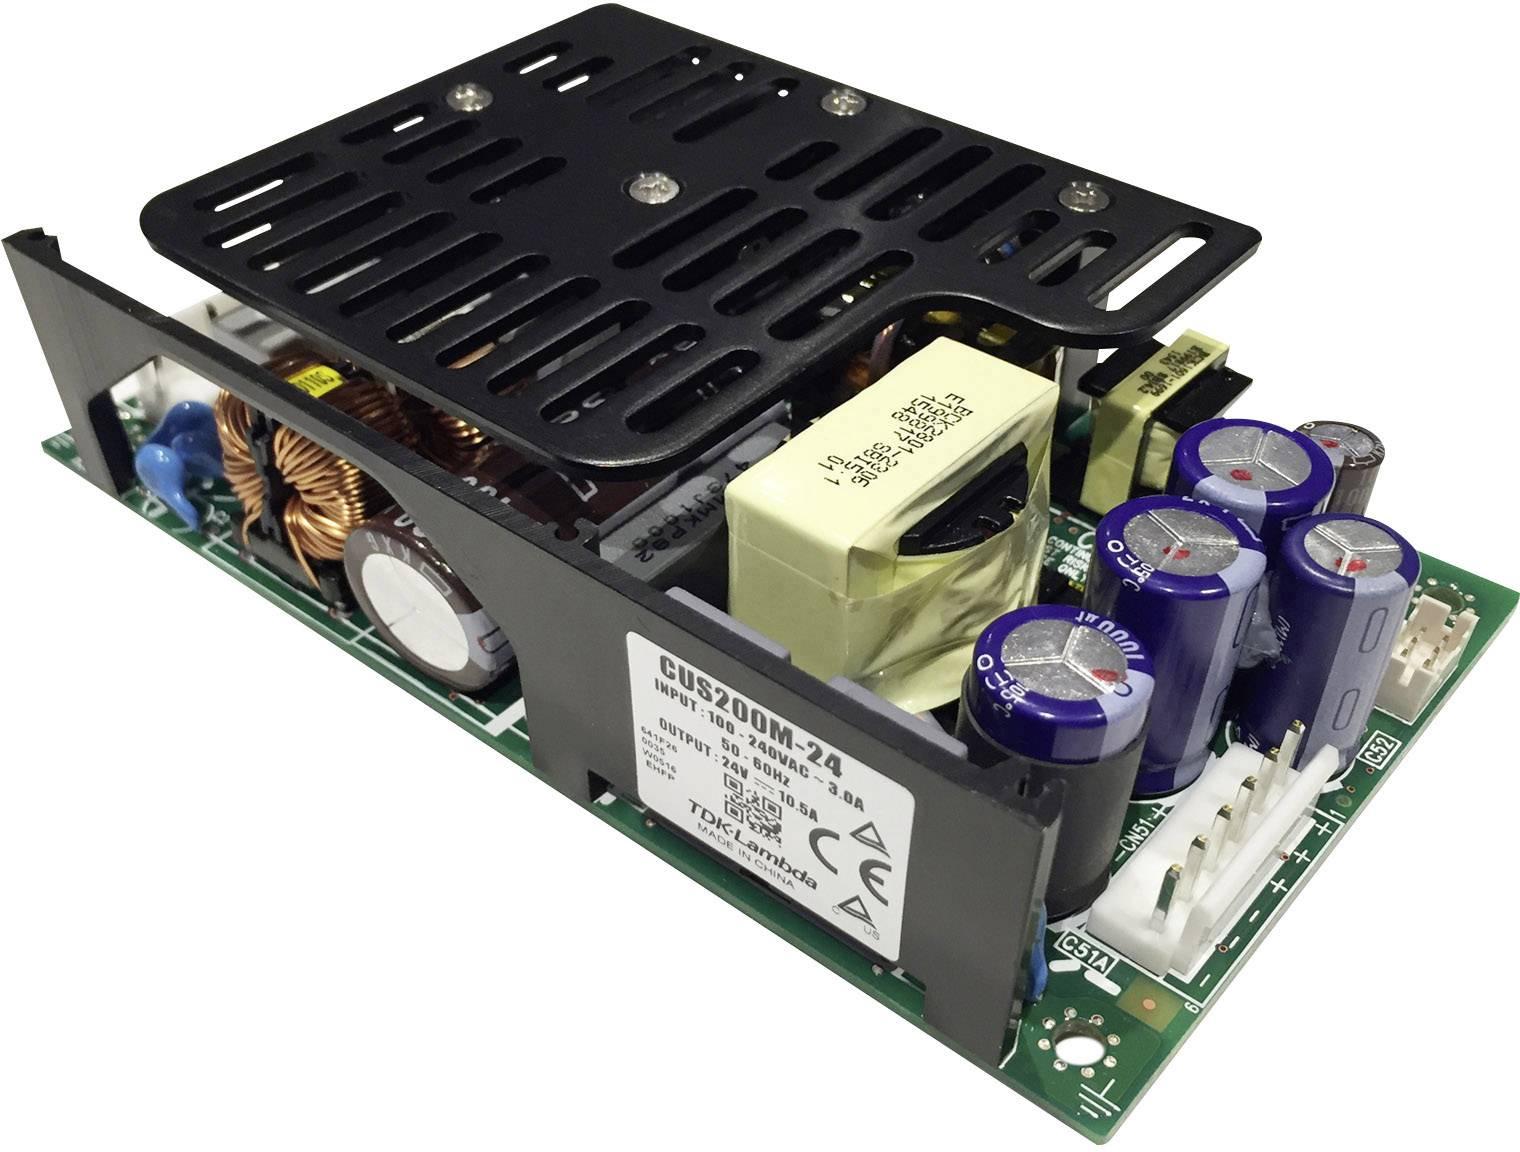 AC/DC vestavný zdroj, open frame TDK-Lambda Medizinisches Netzteil CUS-200M-48, 50.4 V/DC, 5.3 A